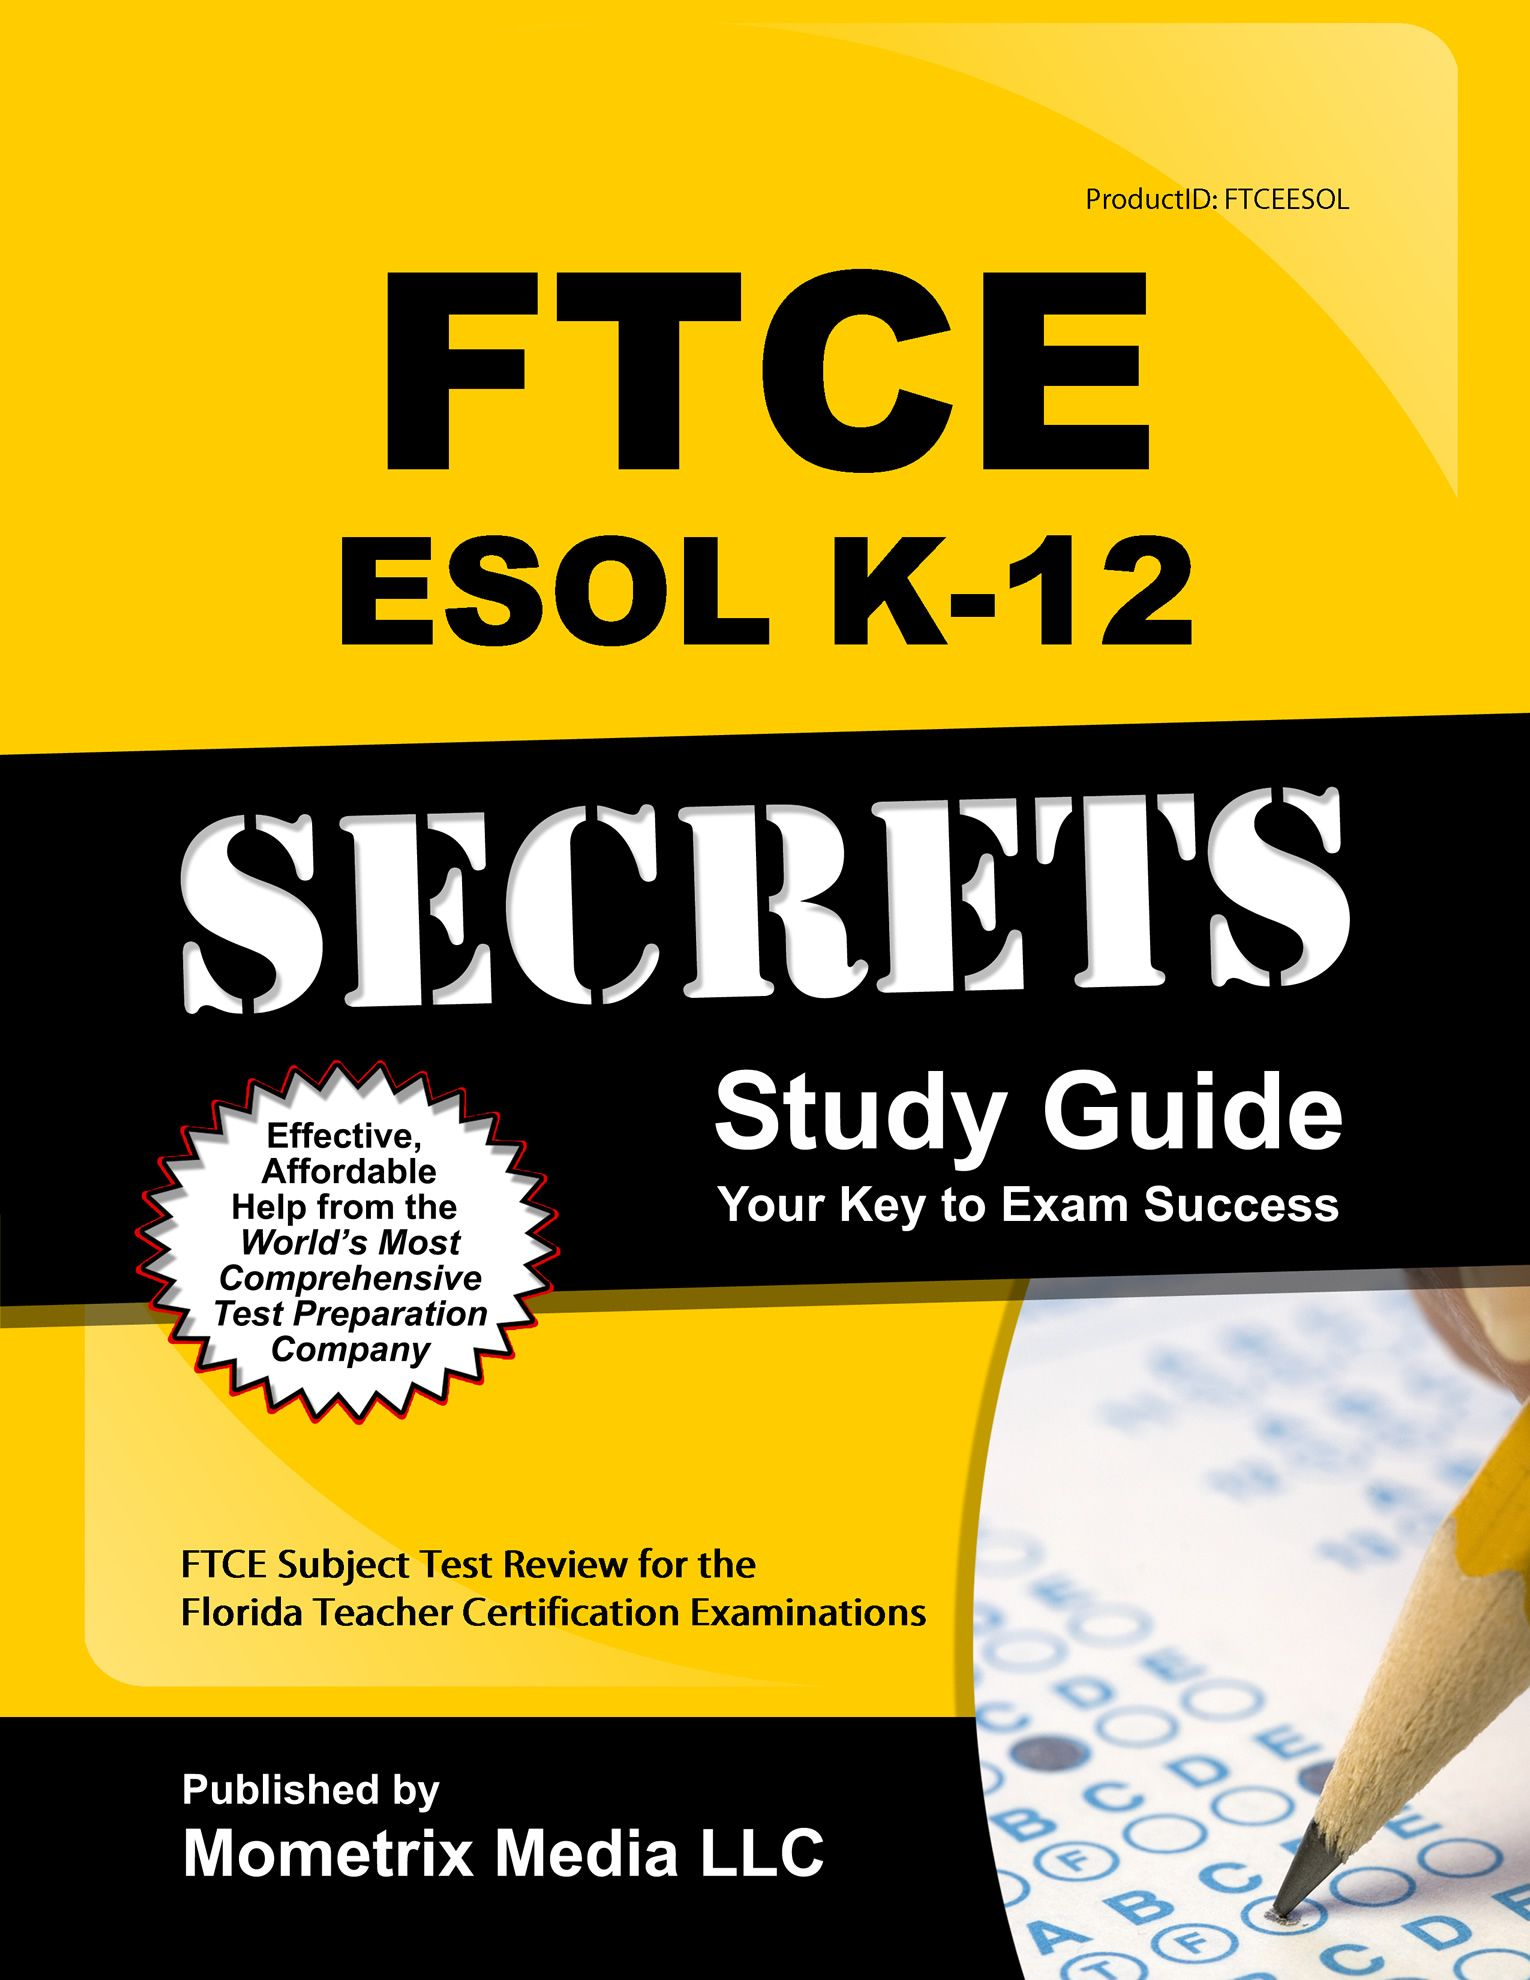 ftce esol k 12 study guide http www mo media com ftce ftce rh pinterest com florida esol endorsement test study guide Study Guide Exam Outlines